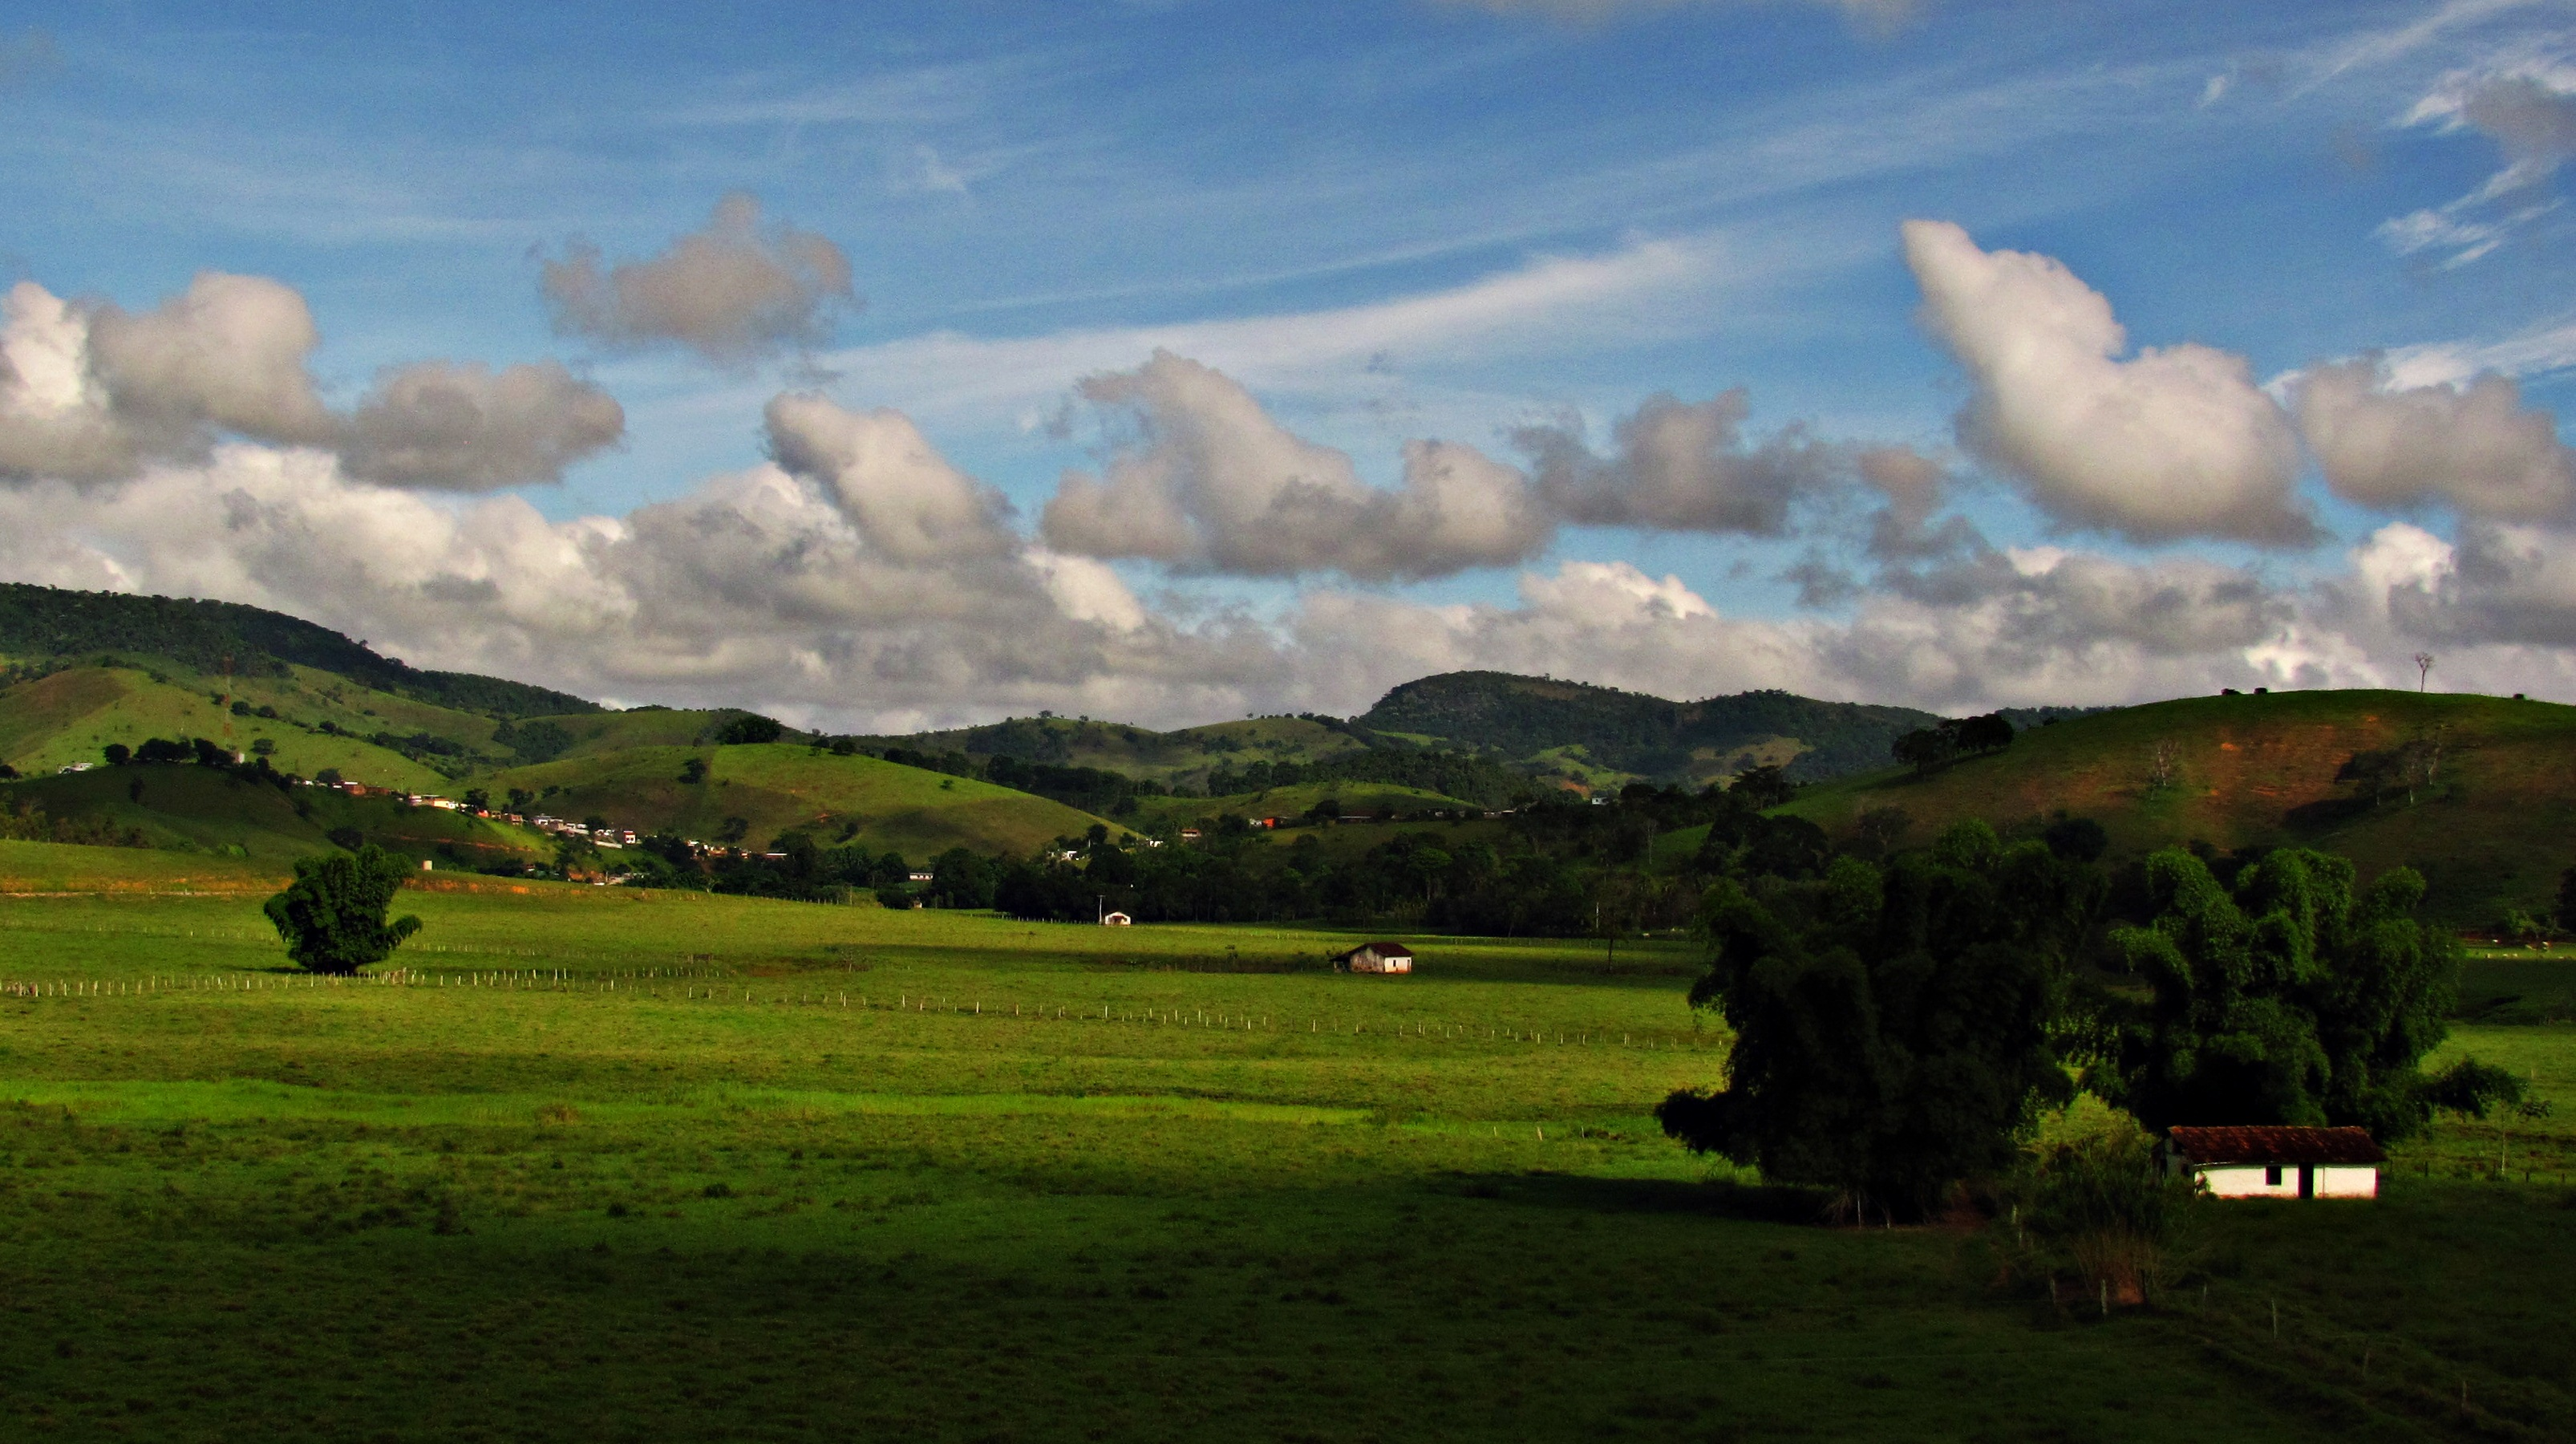 Argirita Minas Gerais fonte: upload.wikimedia.org